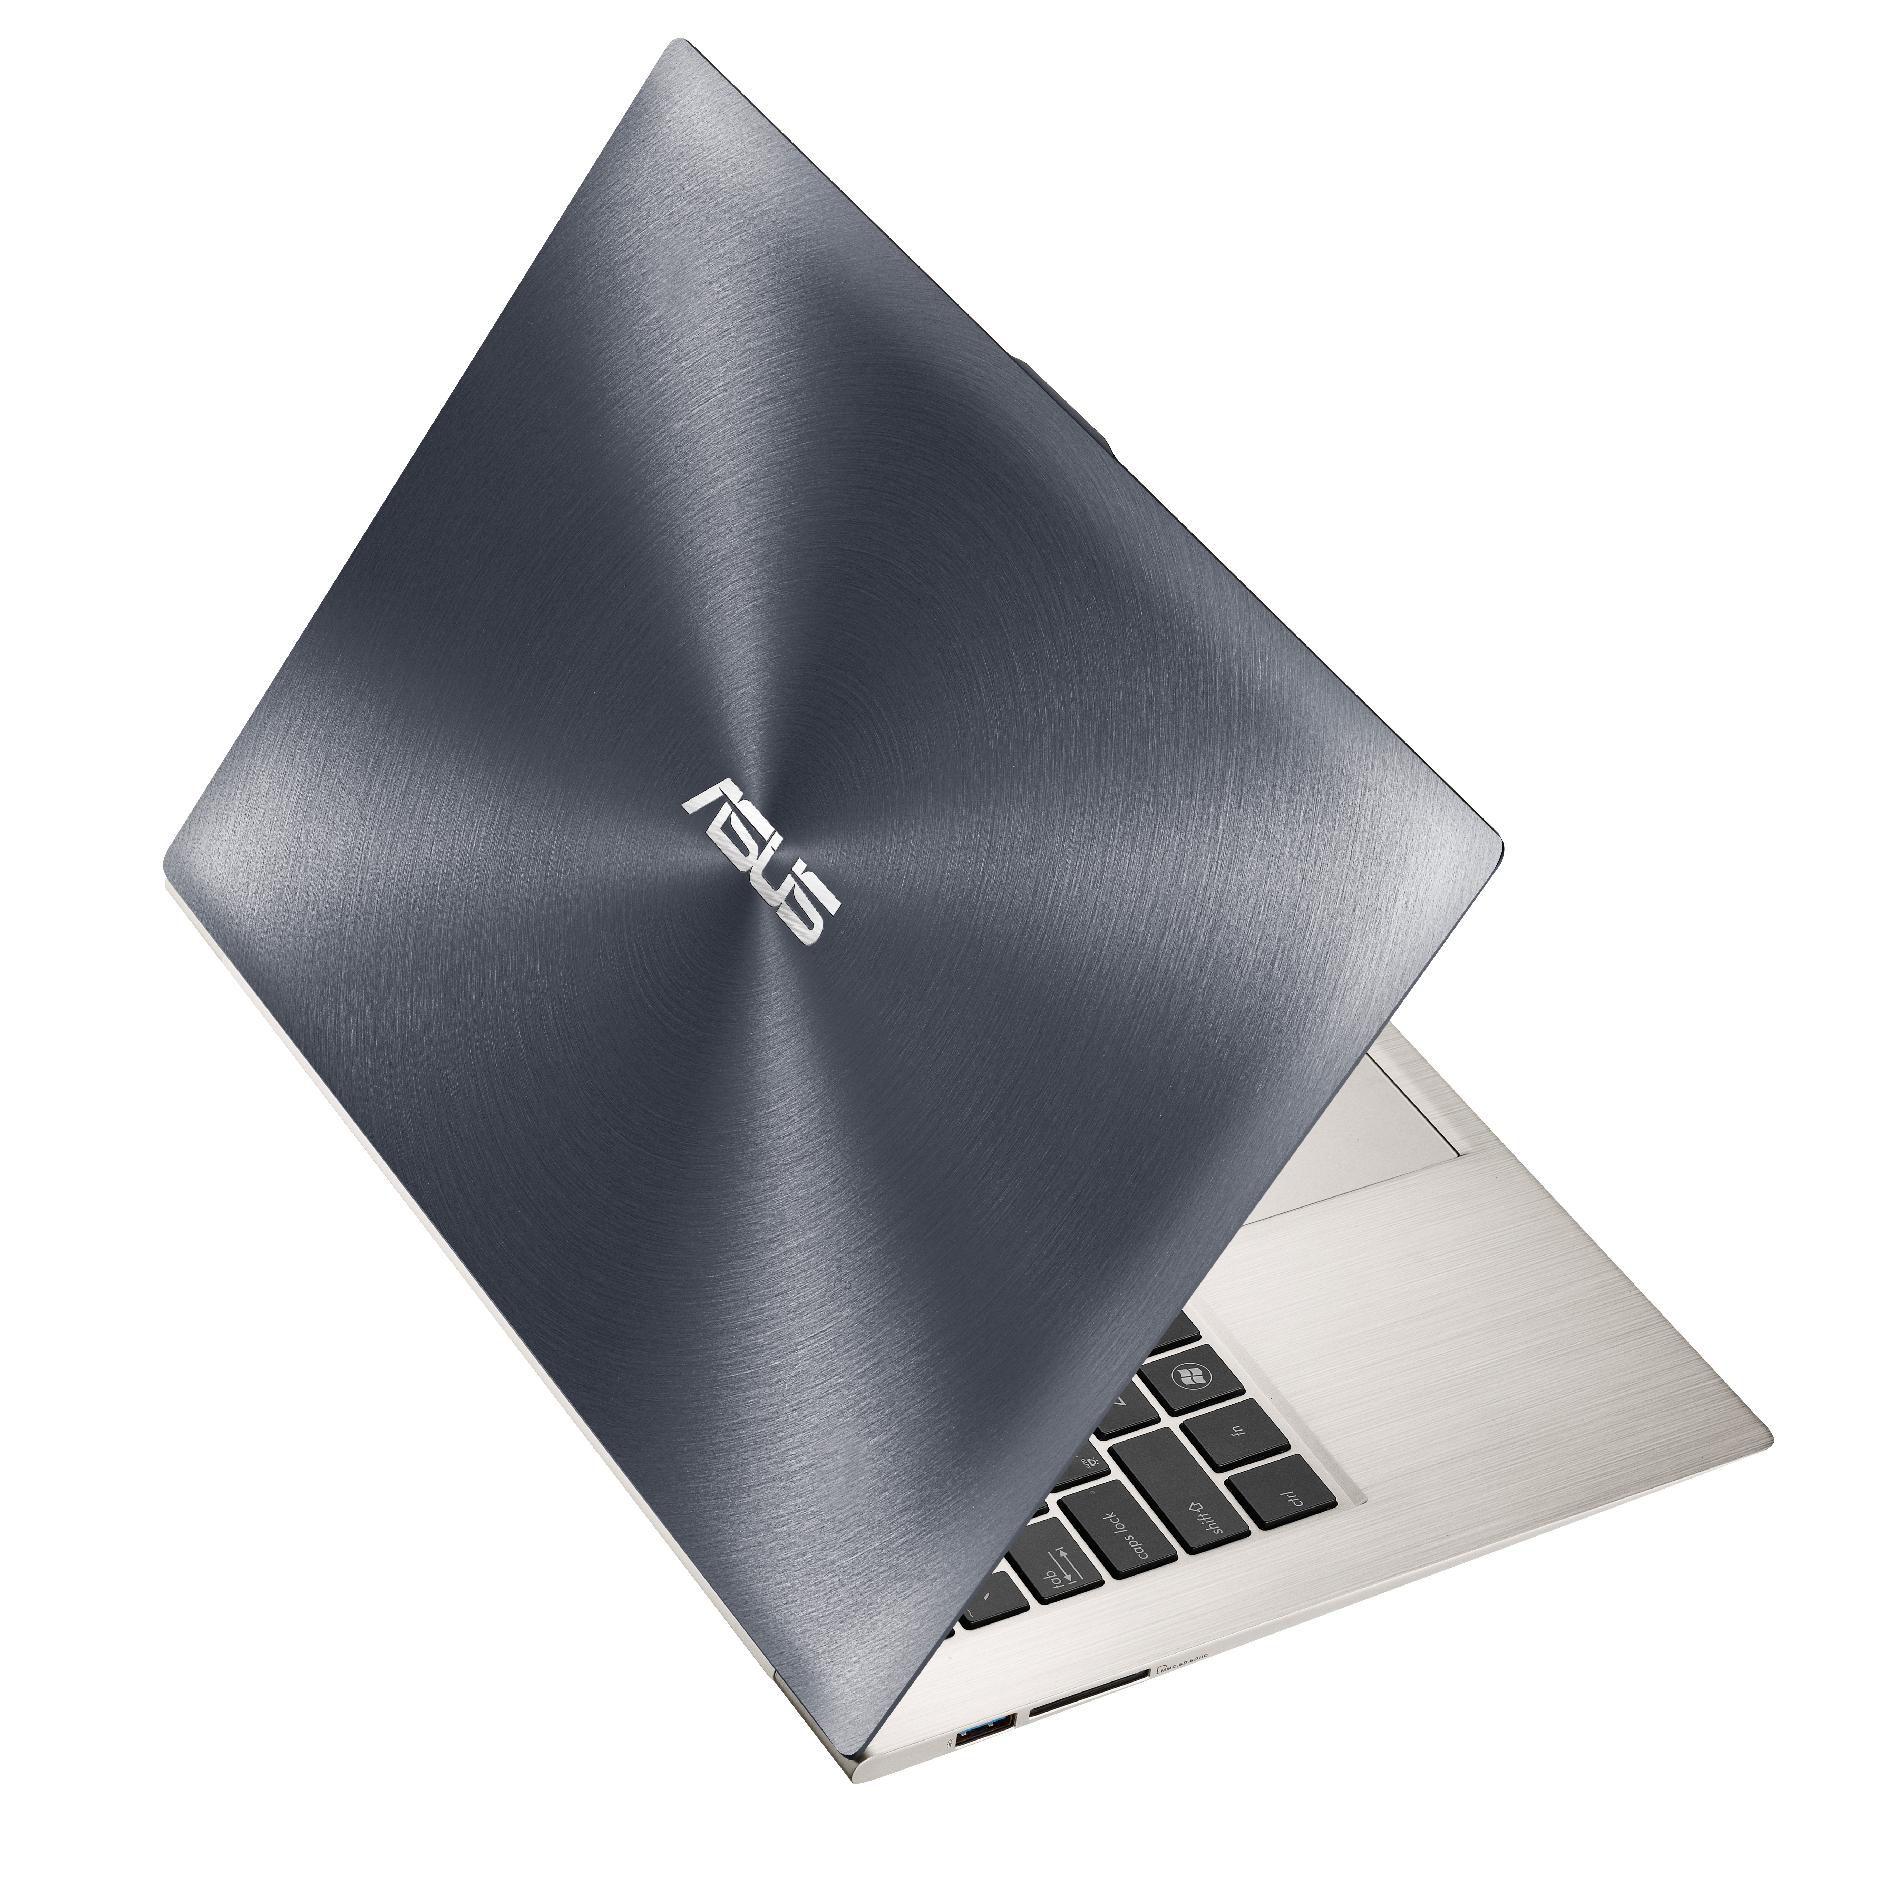 "Asus 13.3"" Zenbook Ultrabook w/ Intel Core i3-2367M 4GB 500GB 24GB SSD Microsoft Windows 7 64-Bit (UX32A-R3502H)"